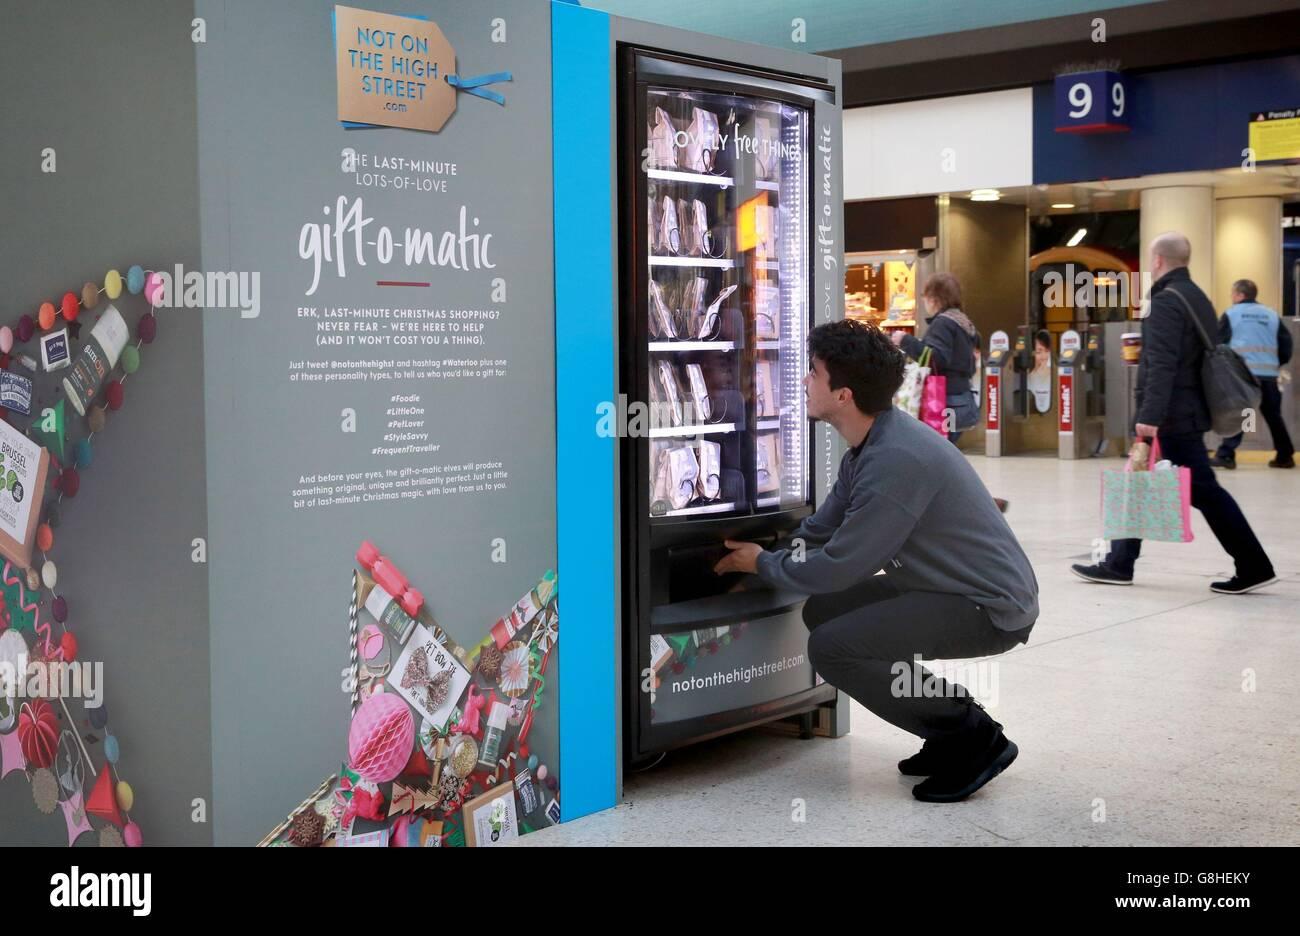 Last minute shopping gift machine Stock Photo, Royalty Free Image ...